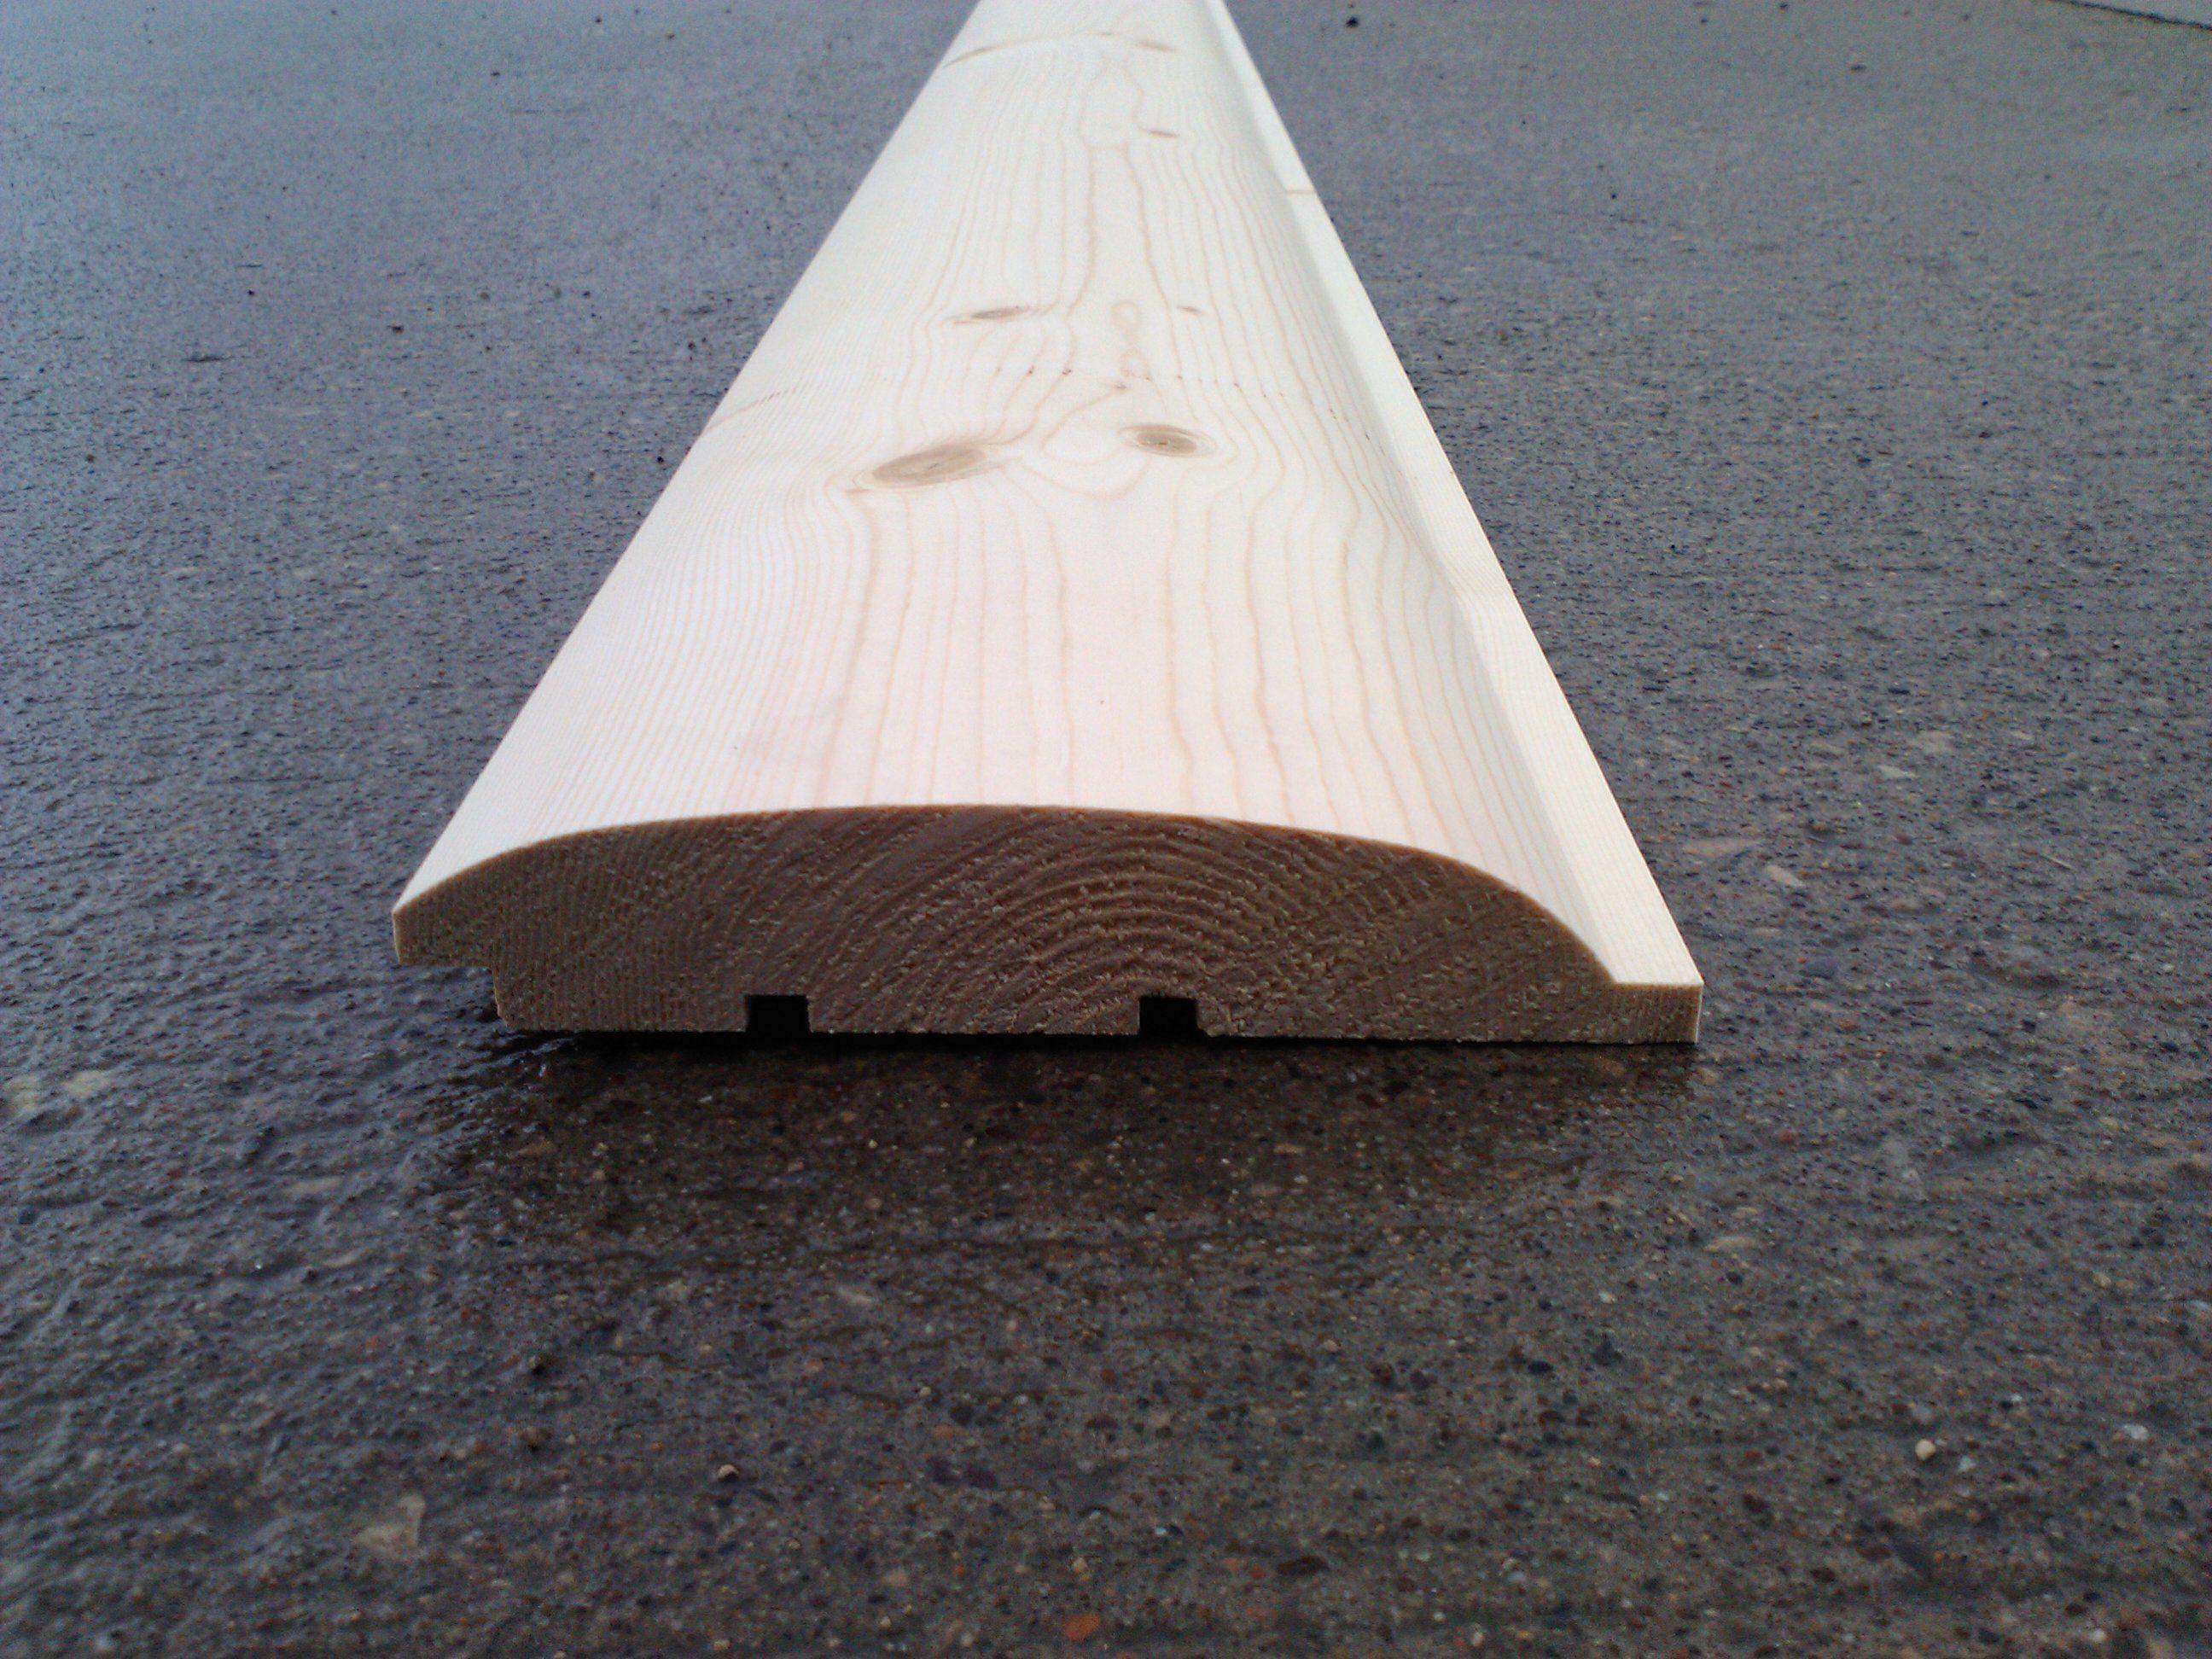 3x8 log siding hand hewn pine - 2x8 Combed Log Timber Siding Meadow Valley Log Homes Profiles Pinterest Logs